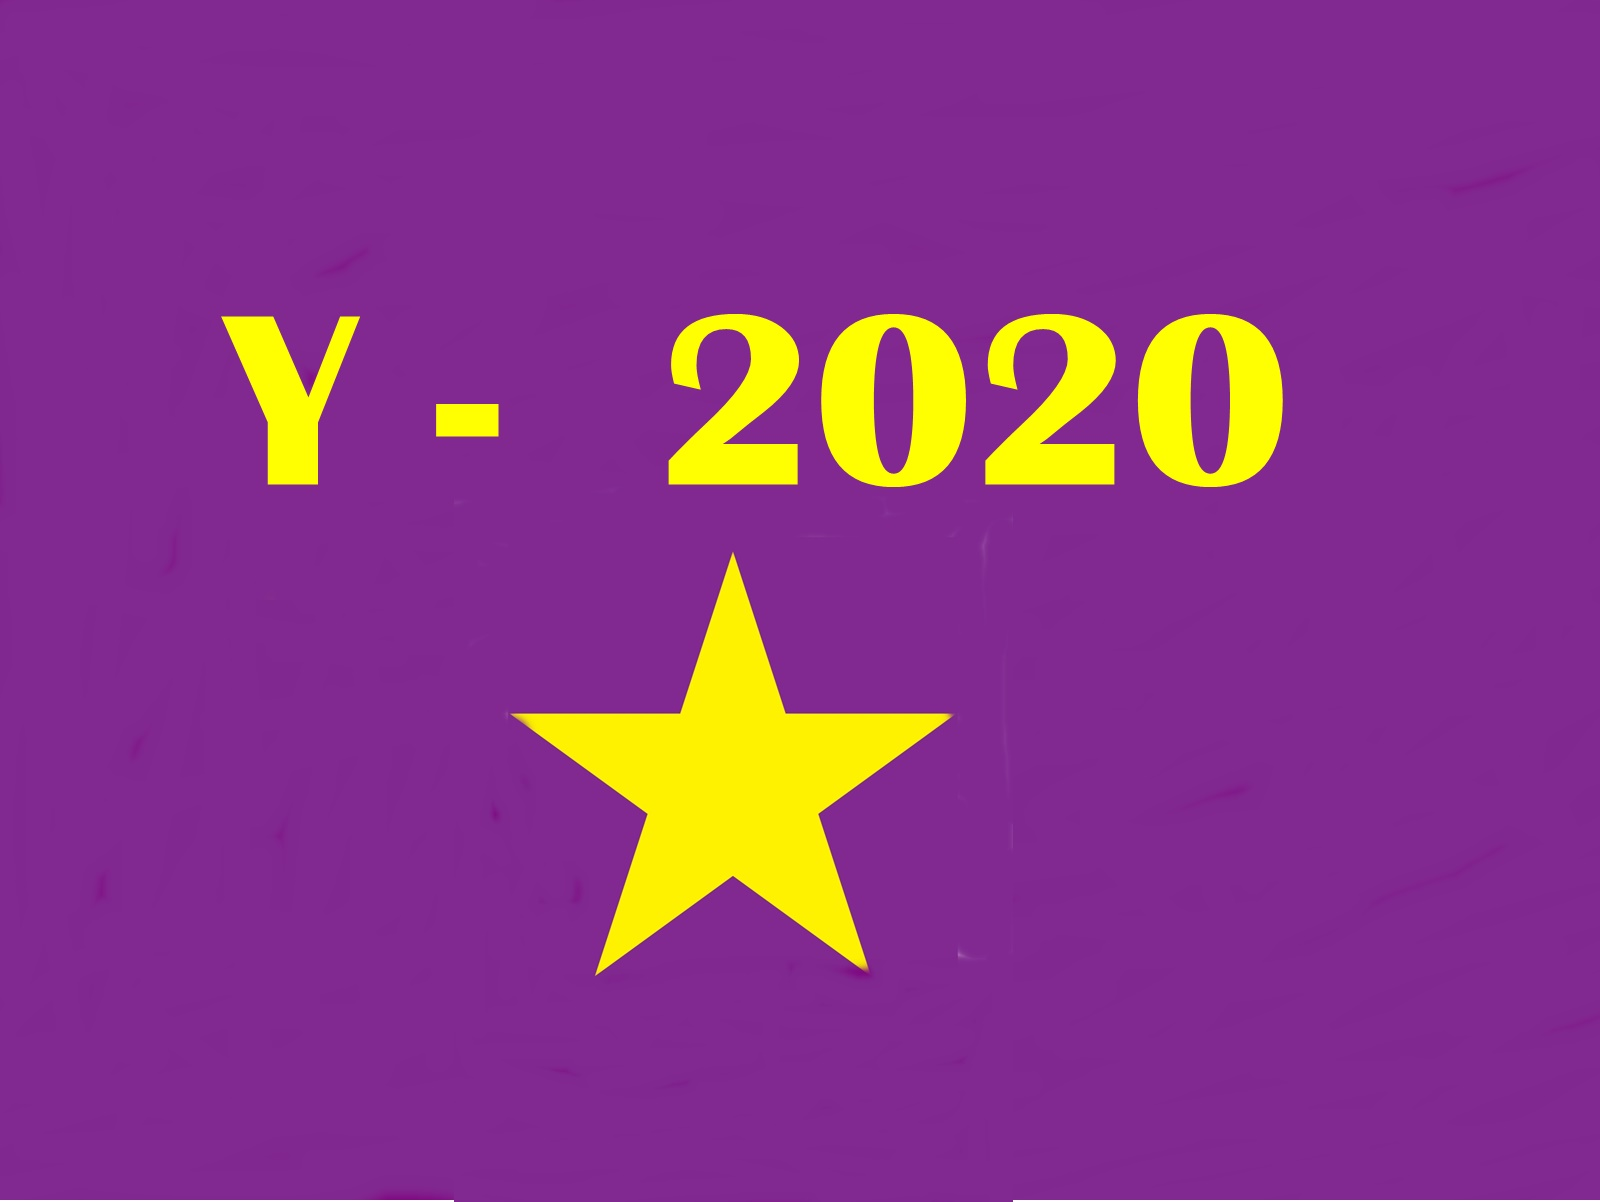 Y - 2020